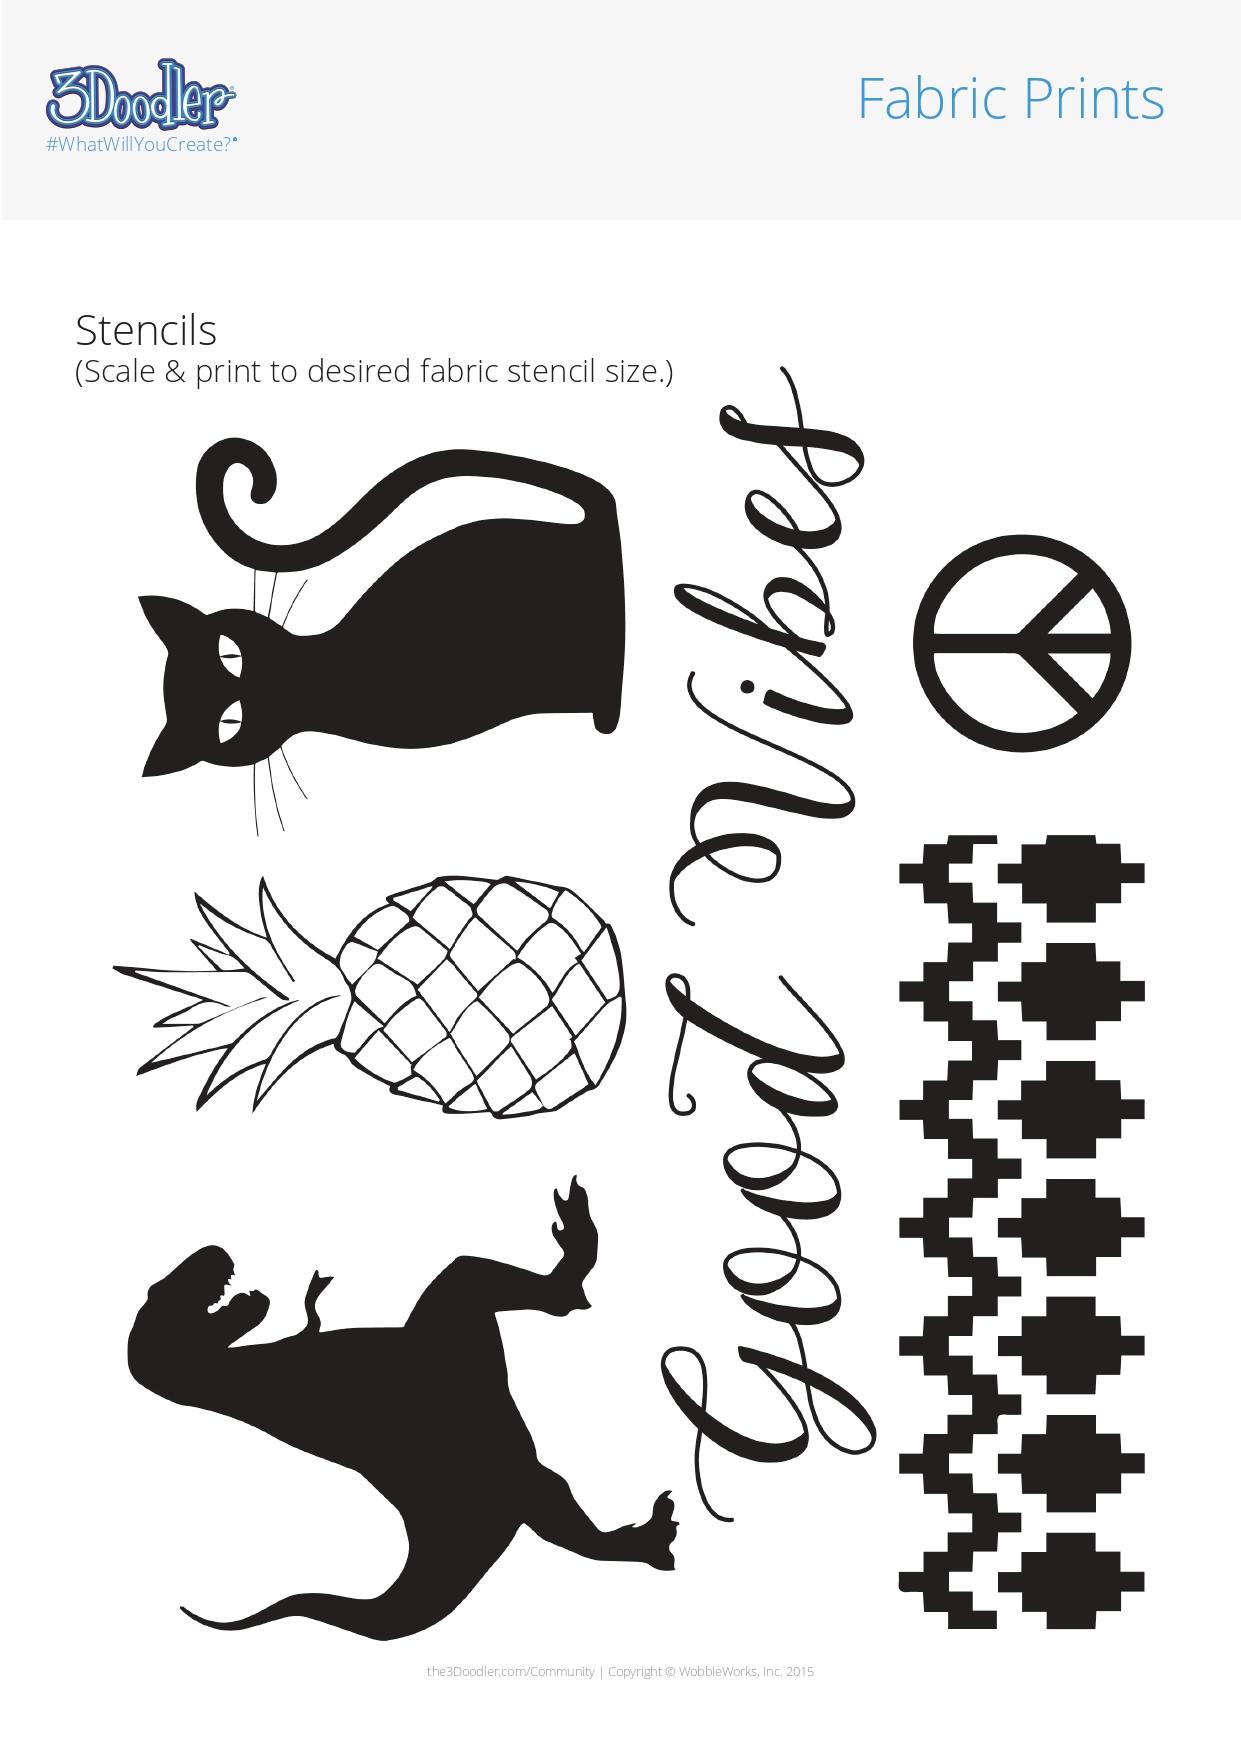 3D Pen Stencil Template Fabric Prints